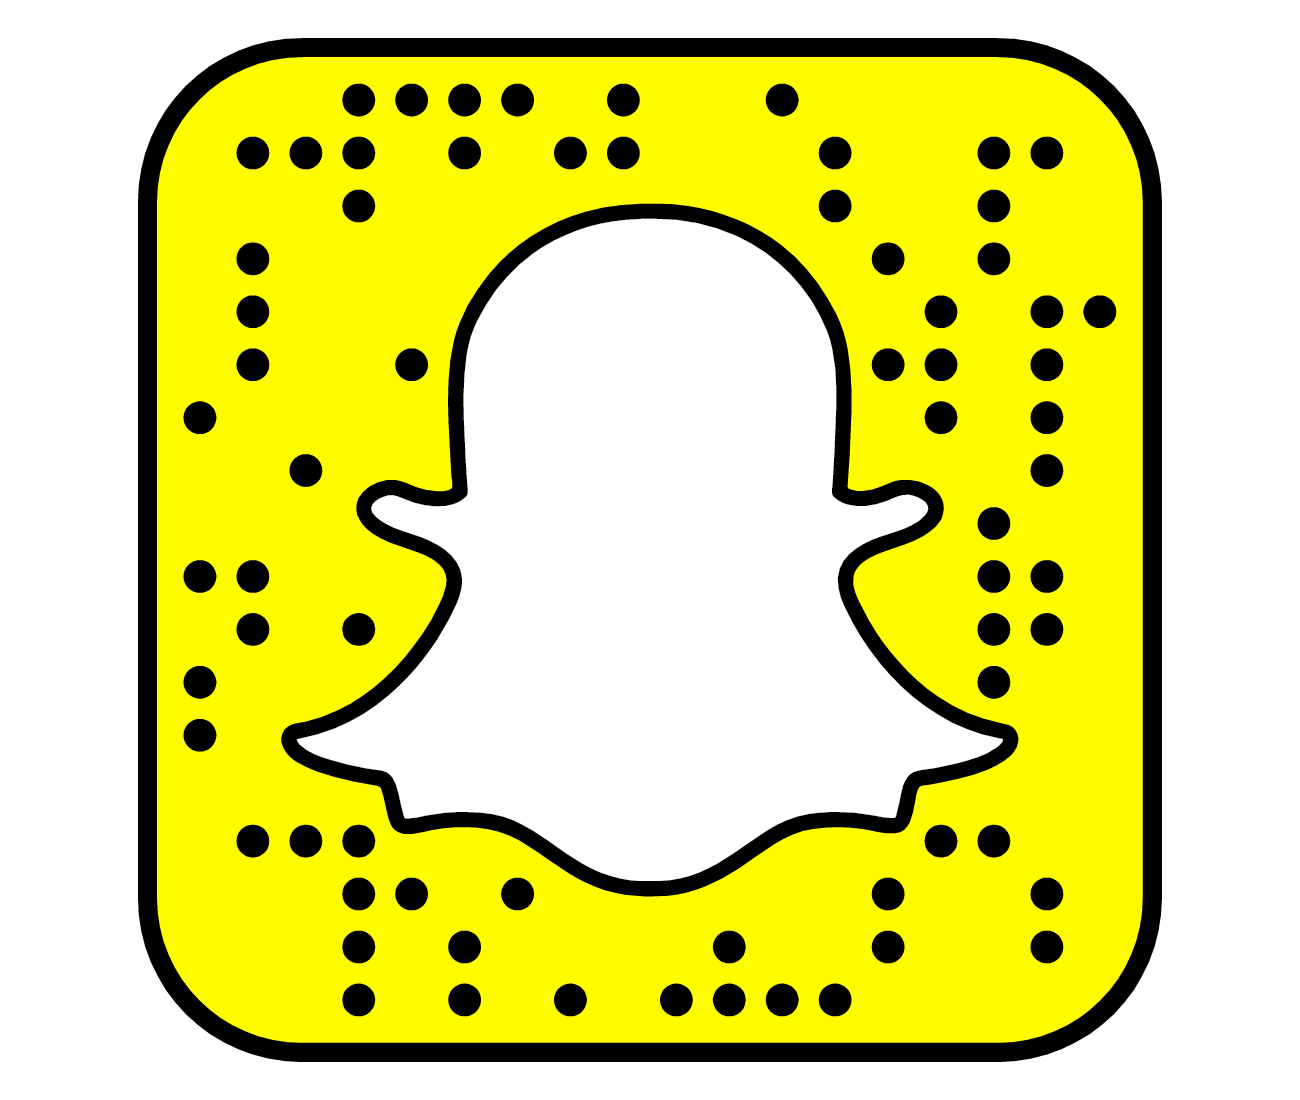 Library of snapchat logo jpg freeuse library transparent ... - Snapchat Logo Edited